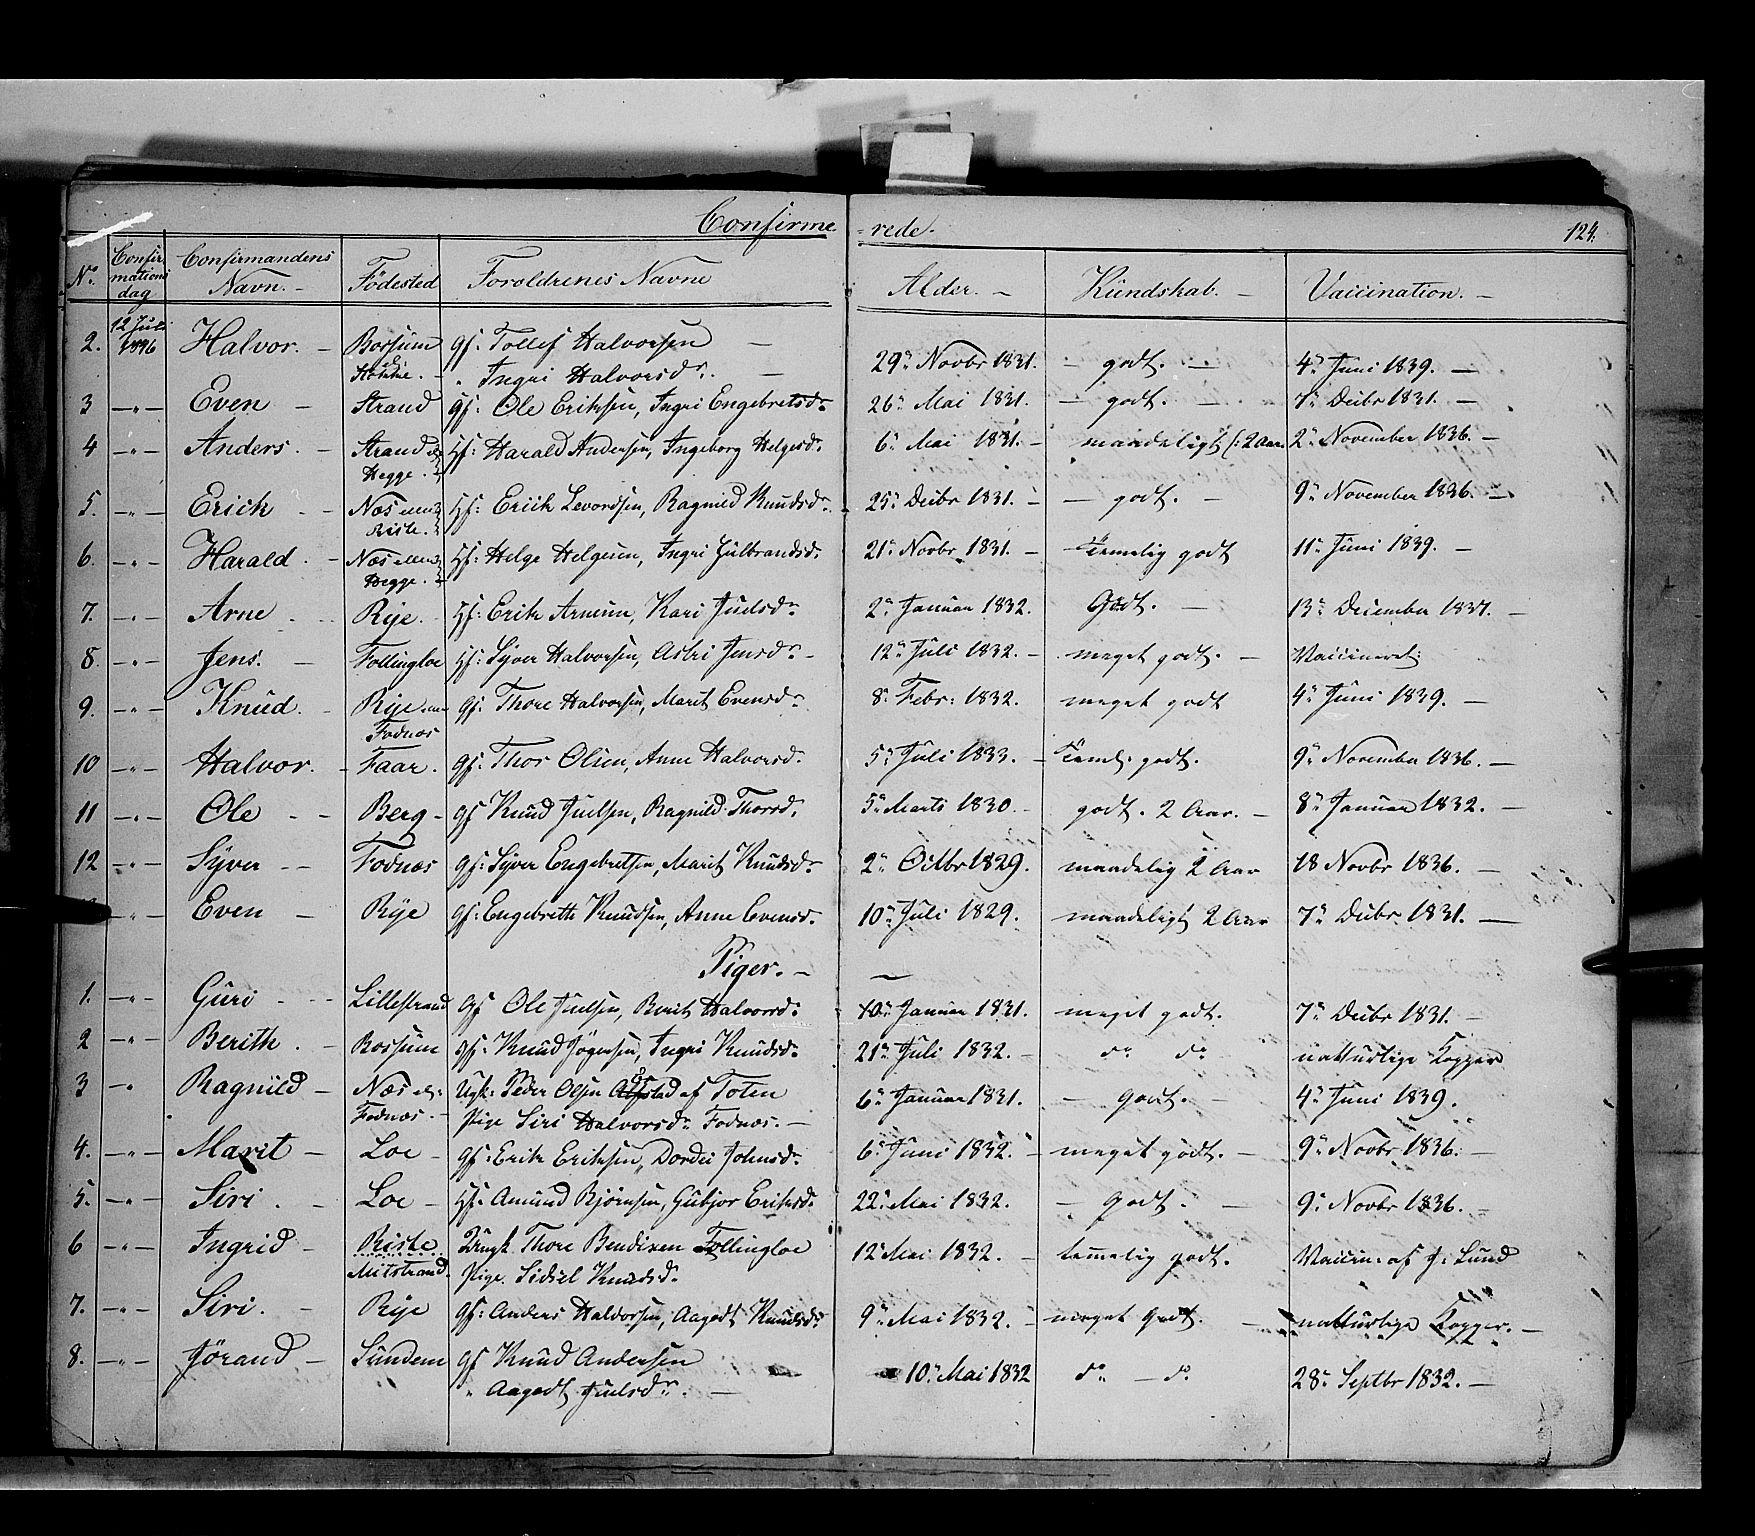 SAH, Nord-Aurdal prestekontor, Ministerialbok nr. 5, 1842-1863, s. 124